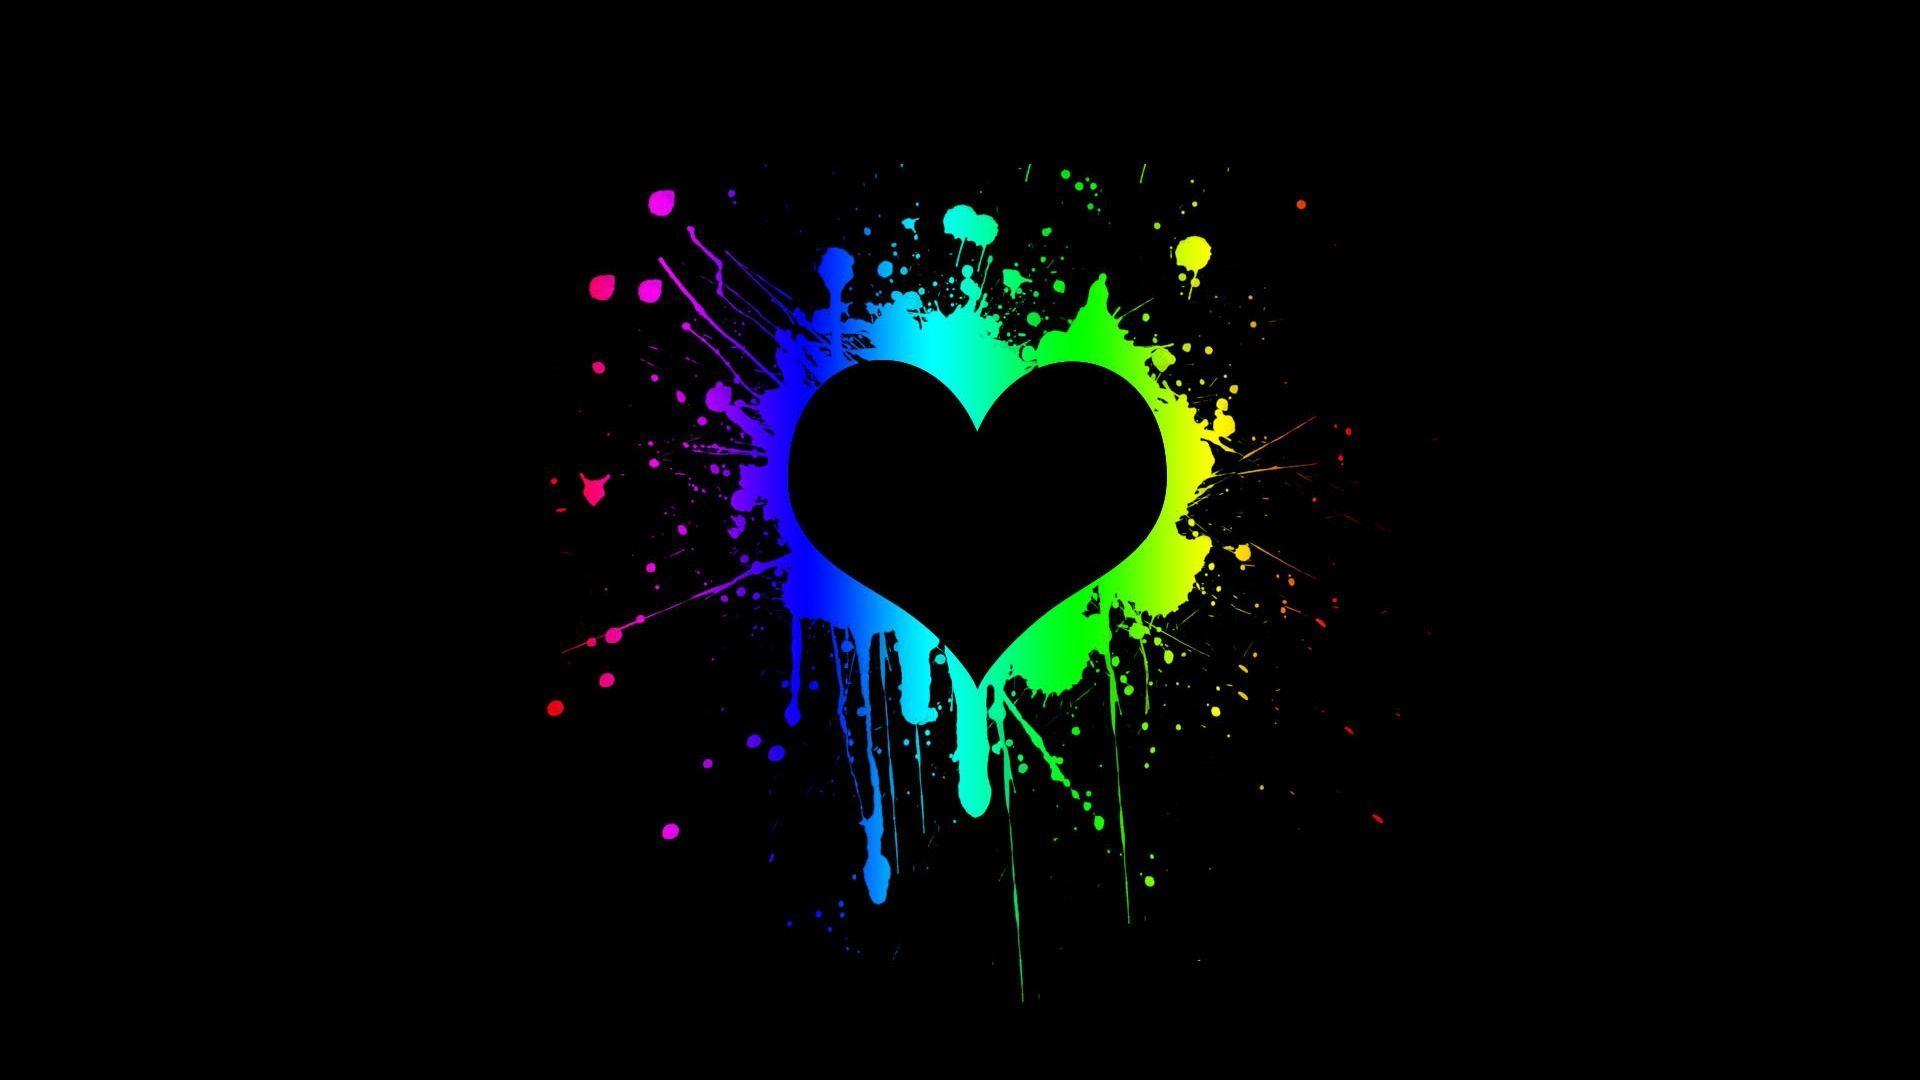 romance images love kiss wallpaper kiss kissing and love romance